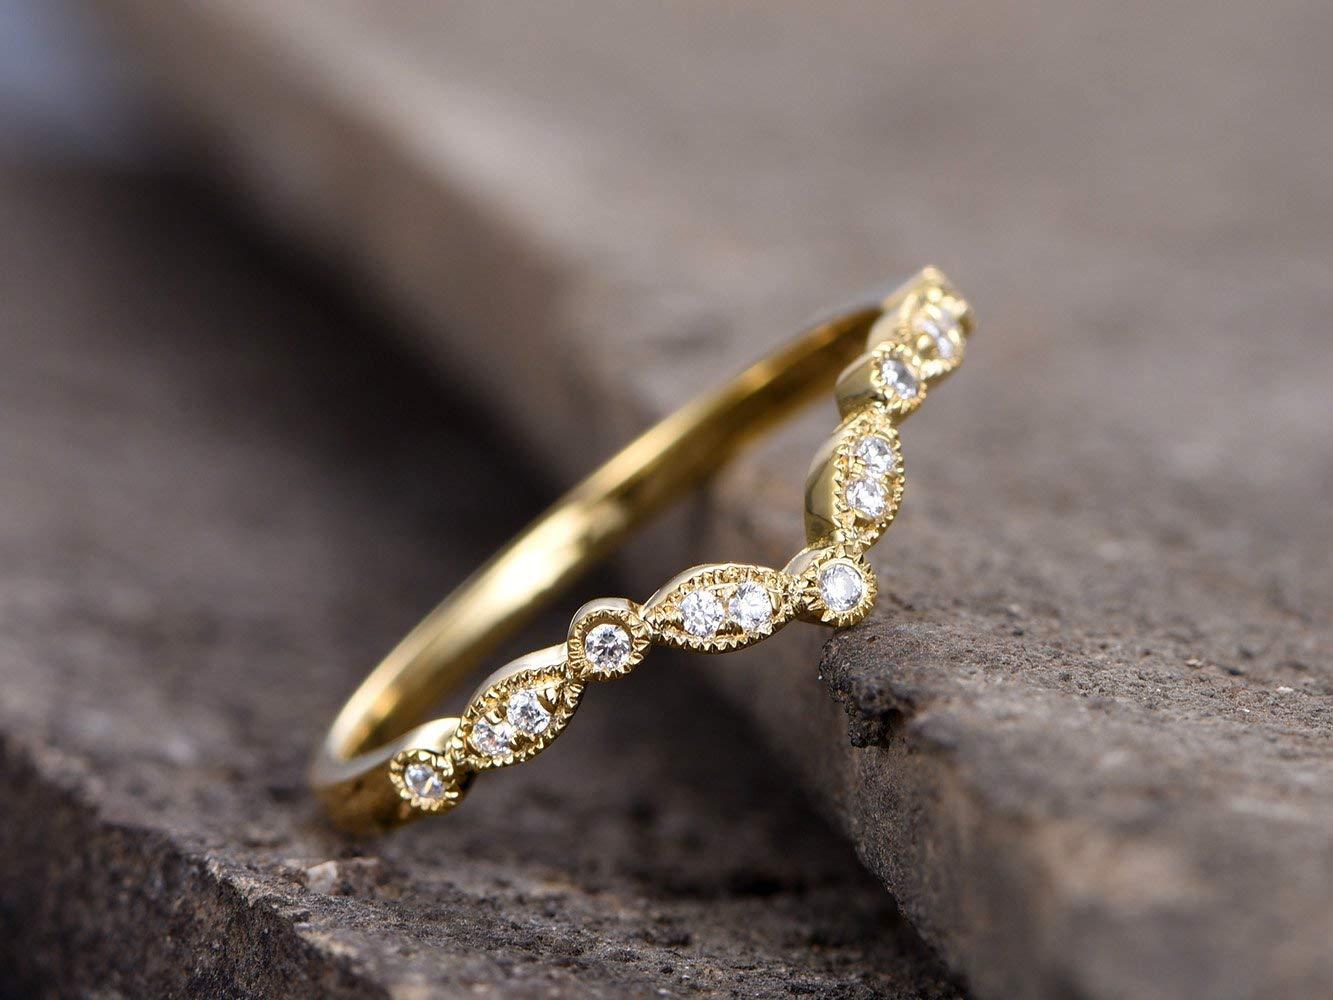 Chevron Ring Delicate Diamond Ring Minimalist Ring Art Deco Wedding Band V Ring Rose Gold Curved Diamond Wedding Band